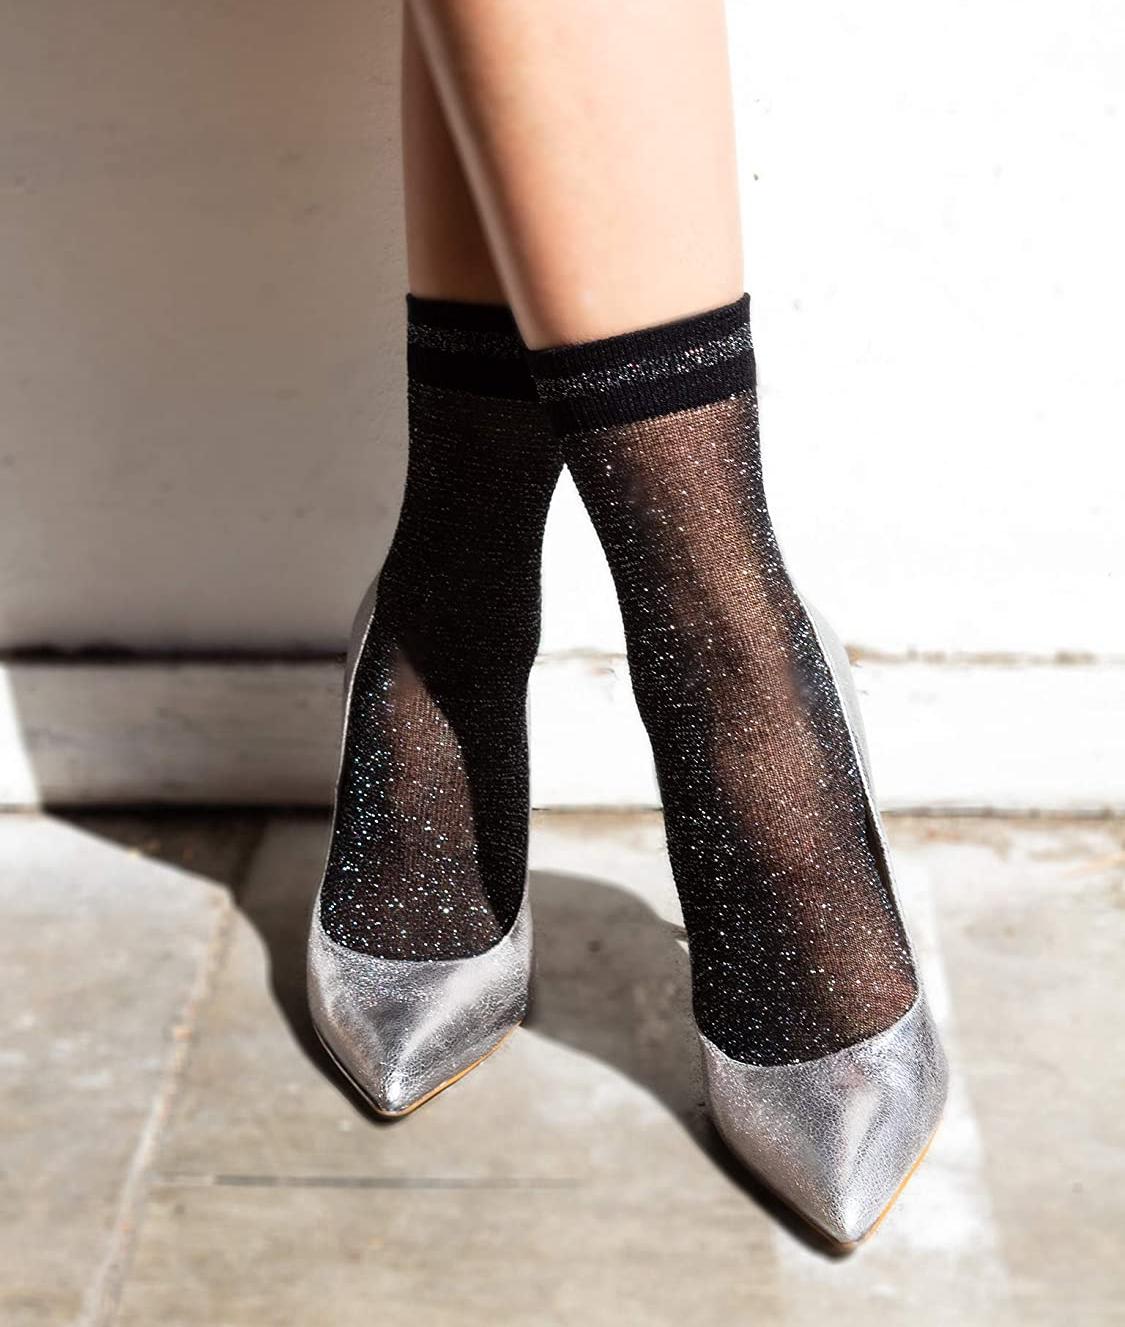 the socks on a model's feet with silver metallic heels